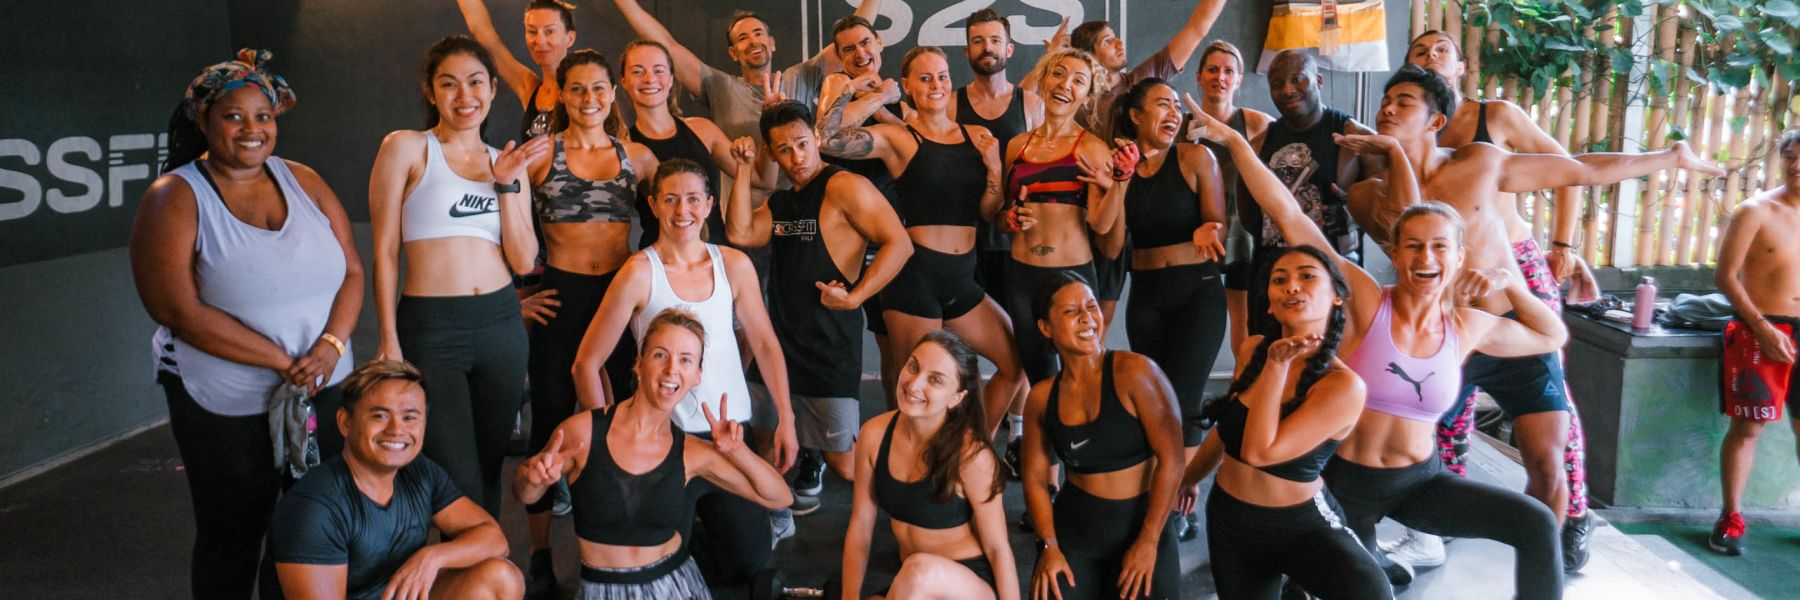 S2S Fitness Bali image